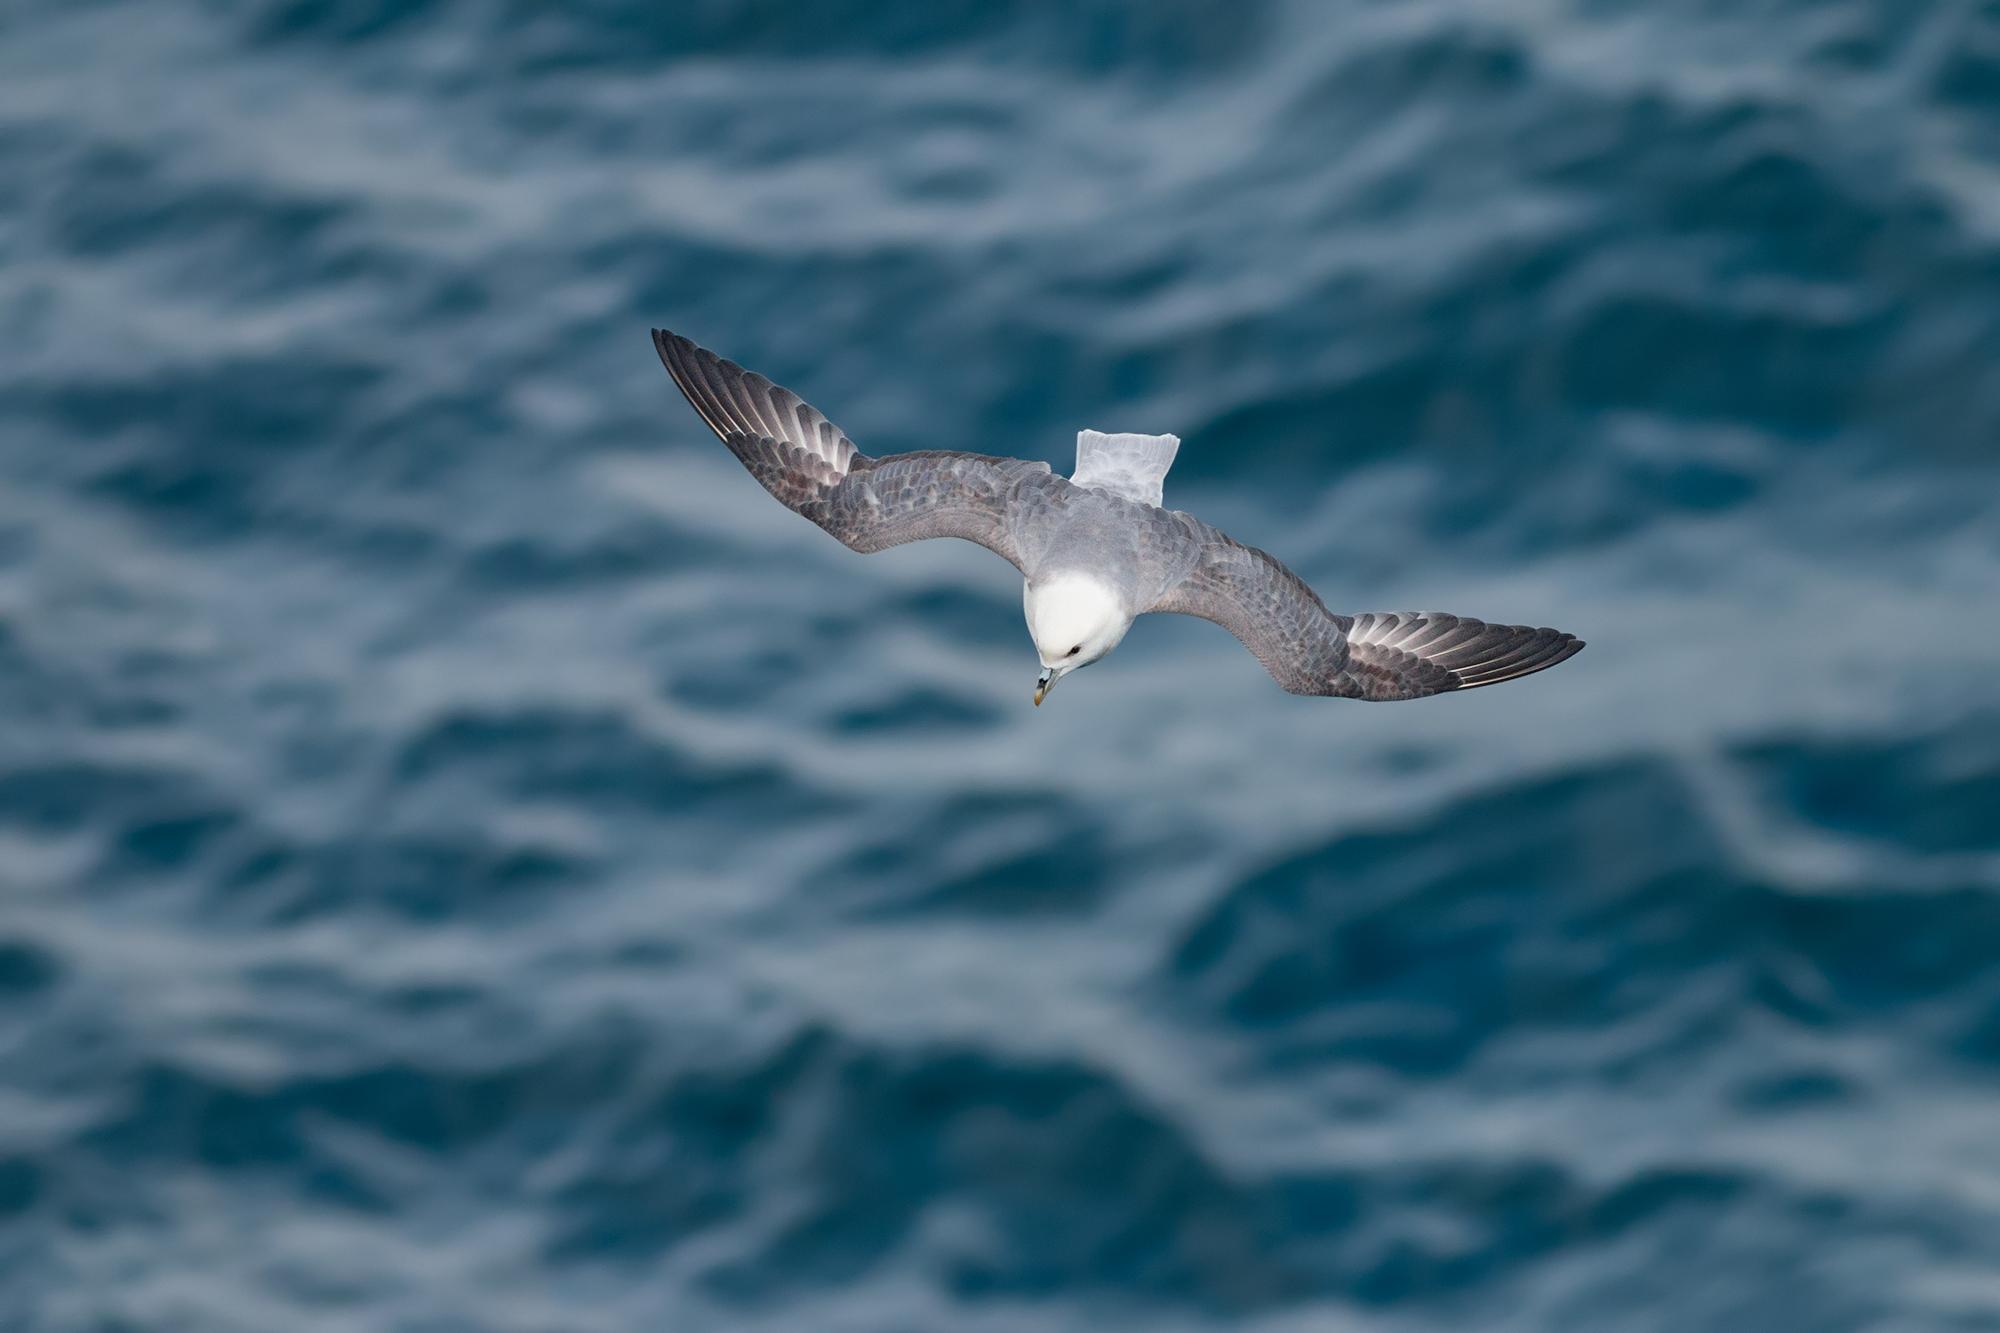 Stormfågel-JPEG_web 7.jpg